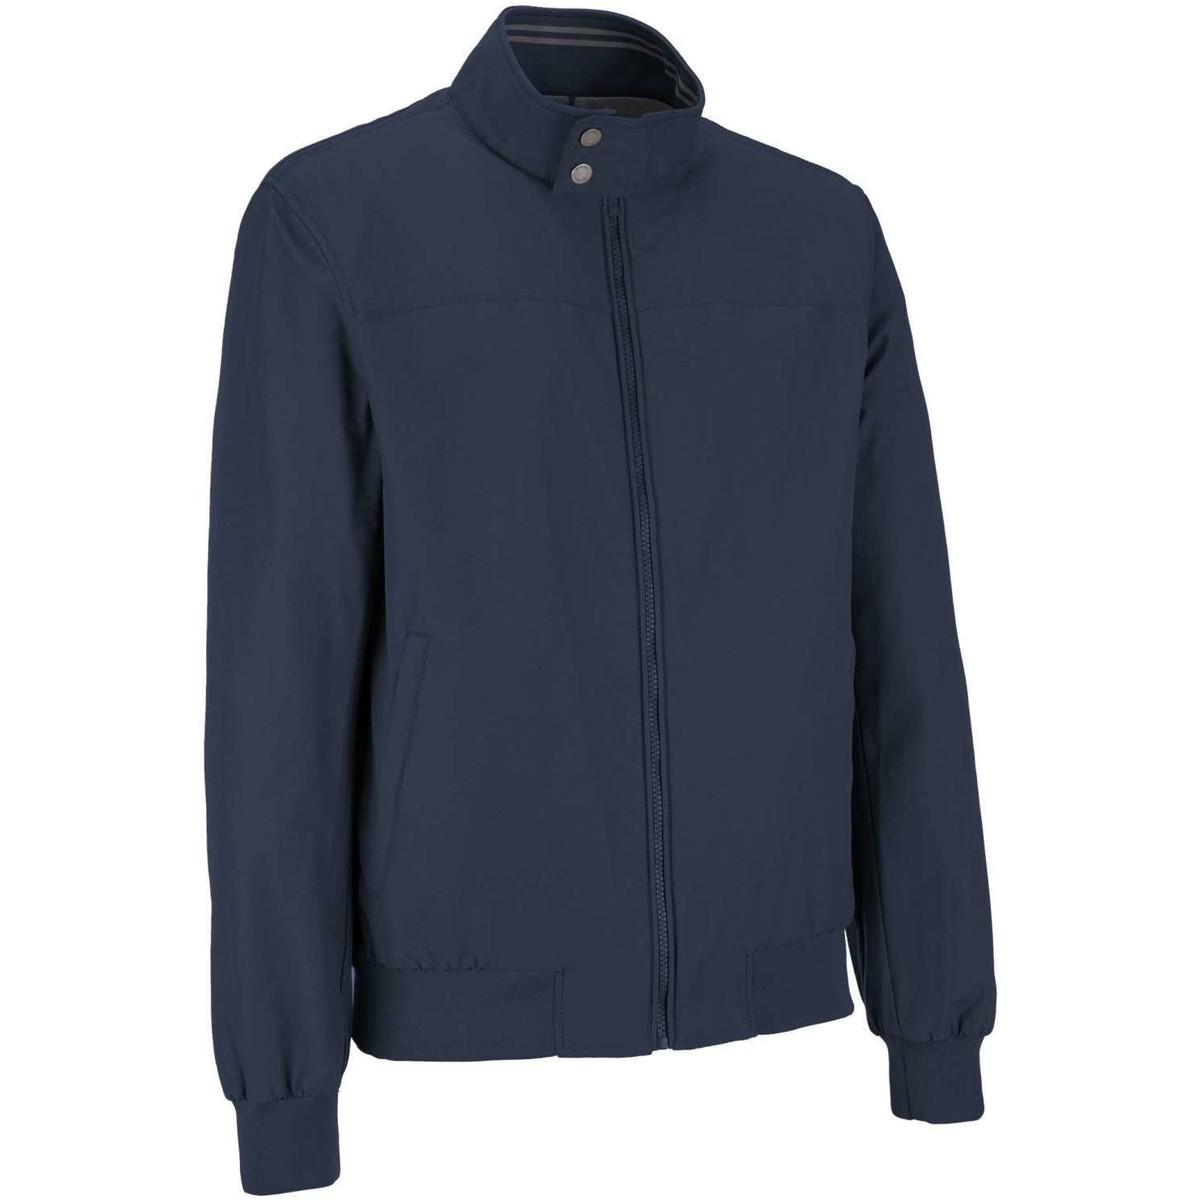 Geox M7220d T2270 Jacket Man Blue Men's Tracksuit Jacket In Blue for Men